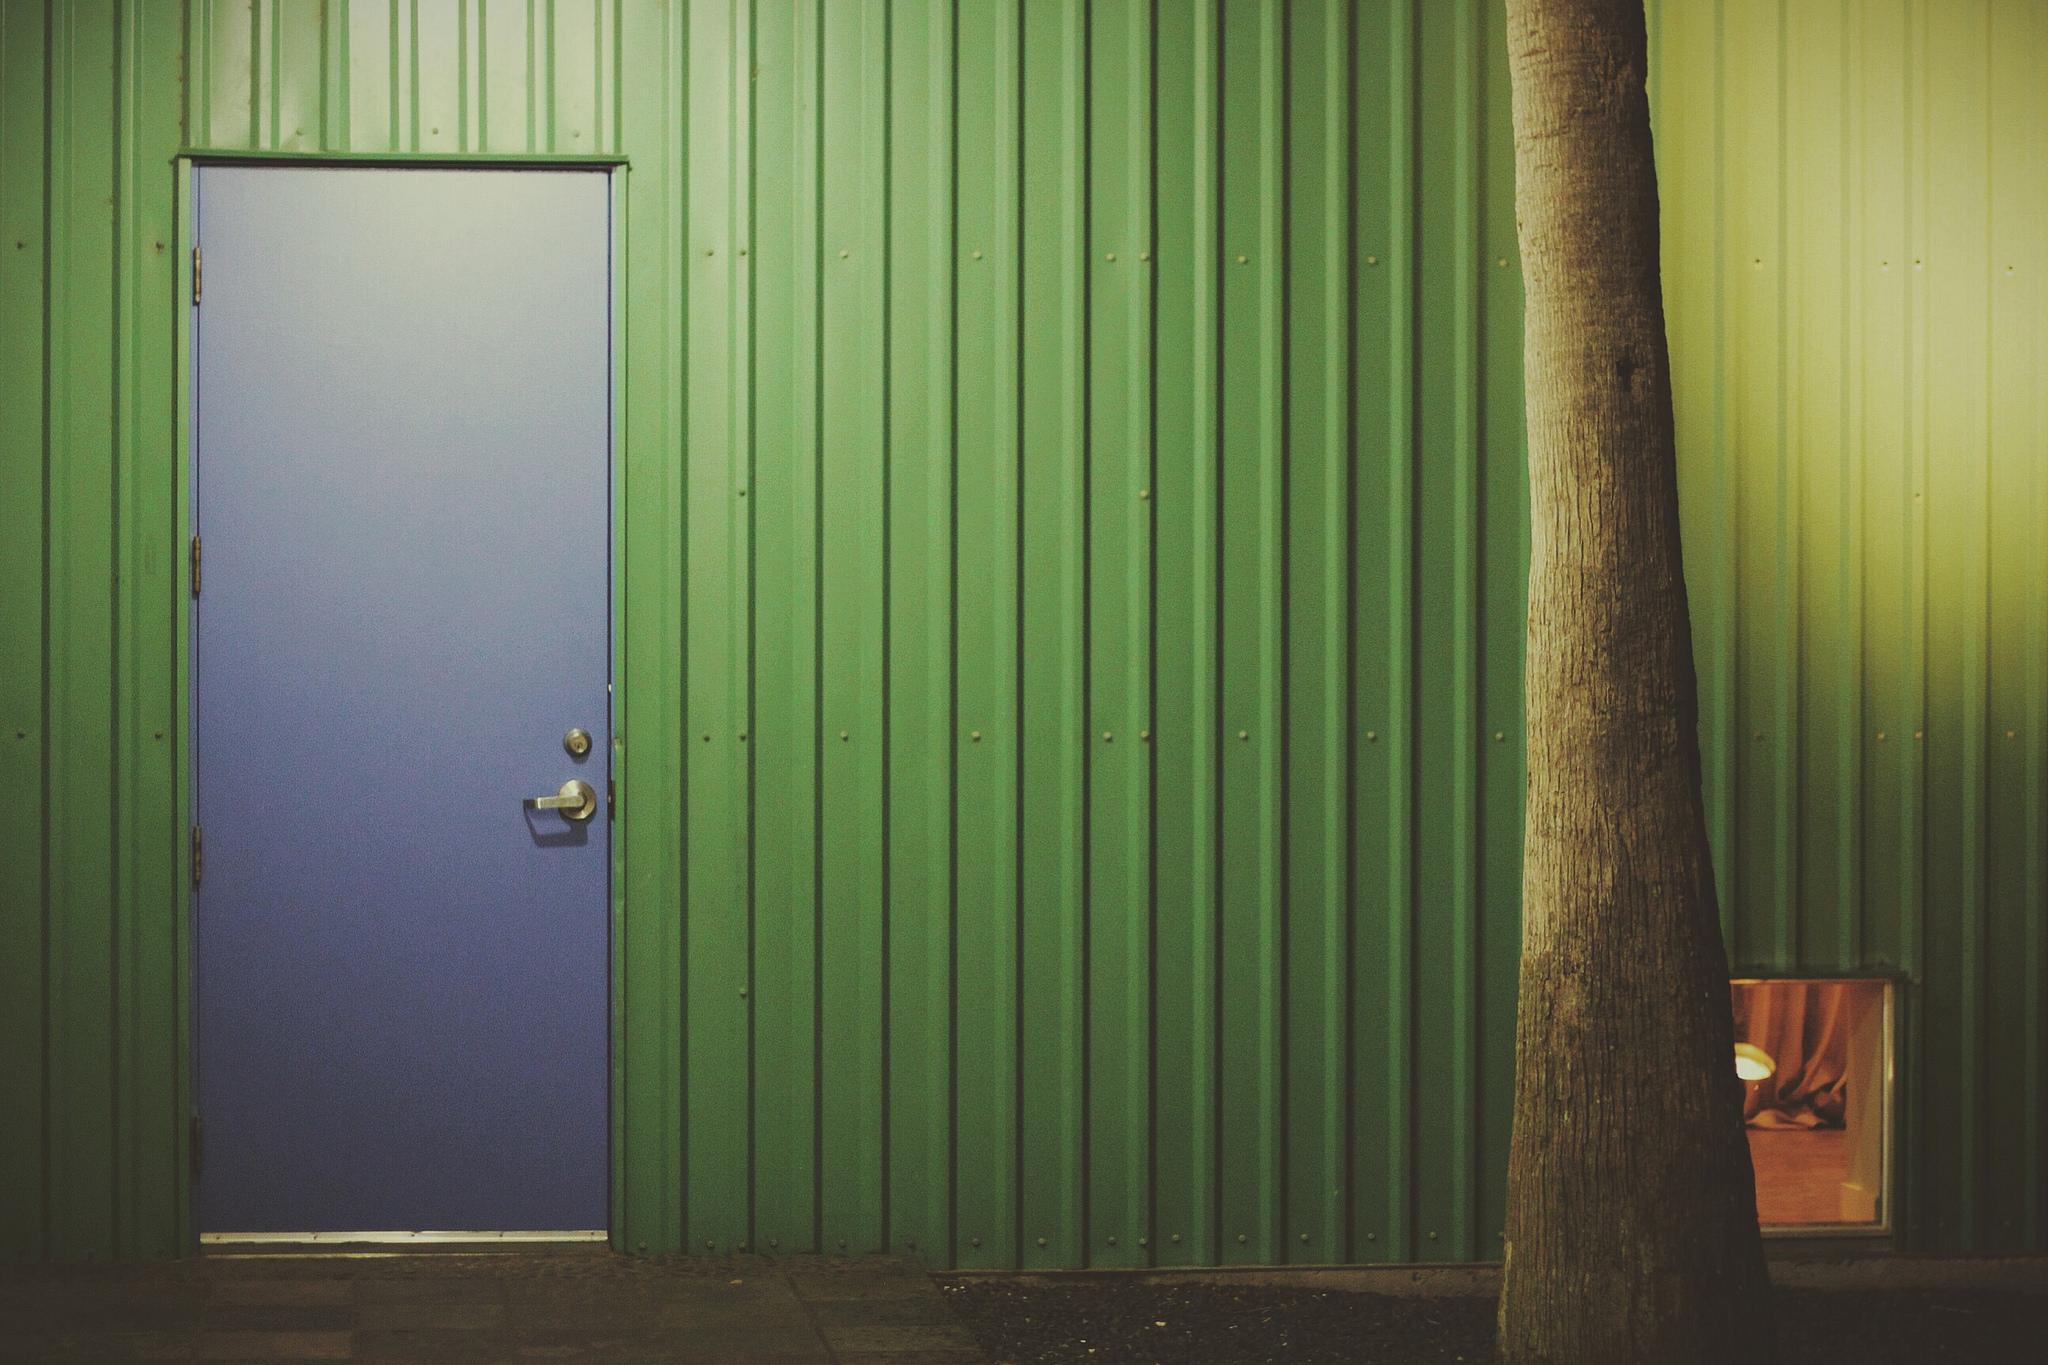 Closed blue door, in a green metal wall